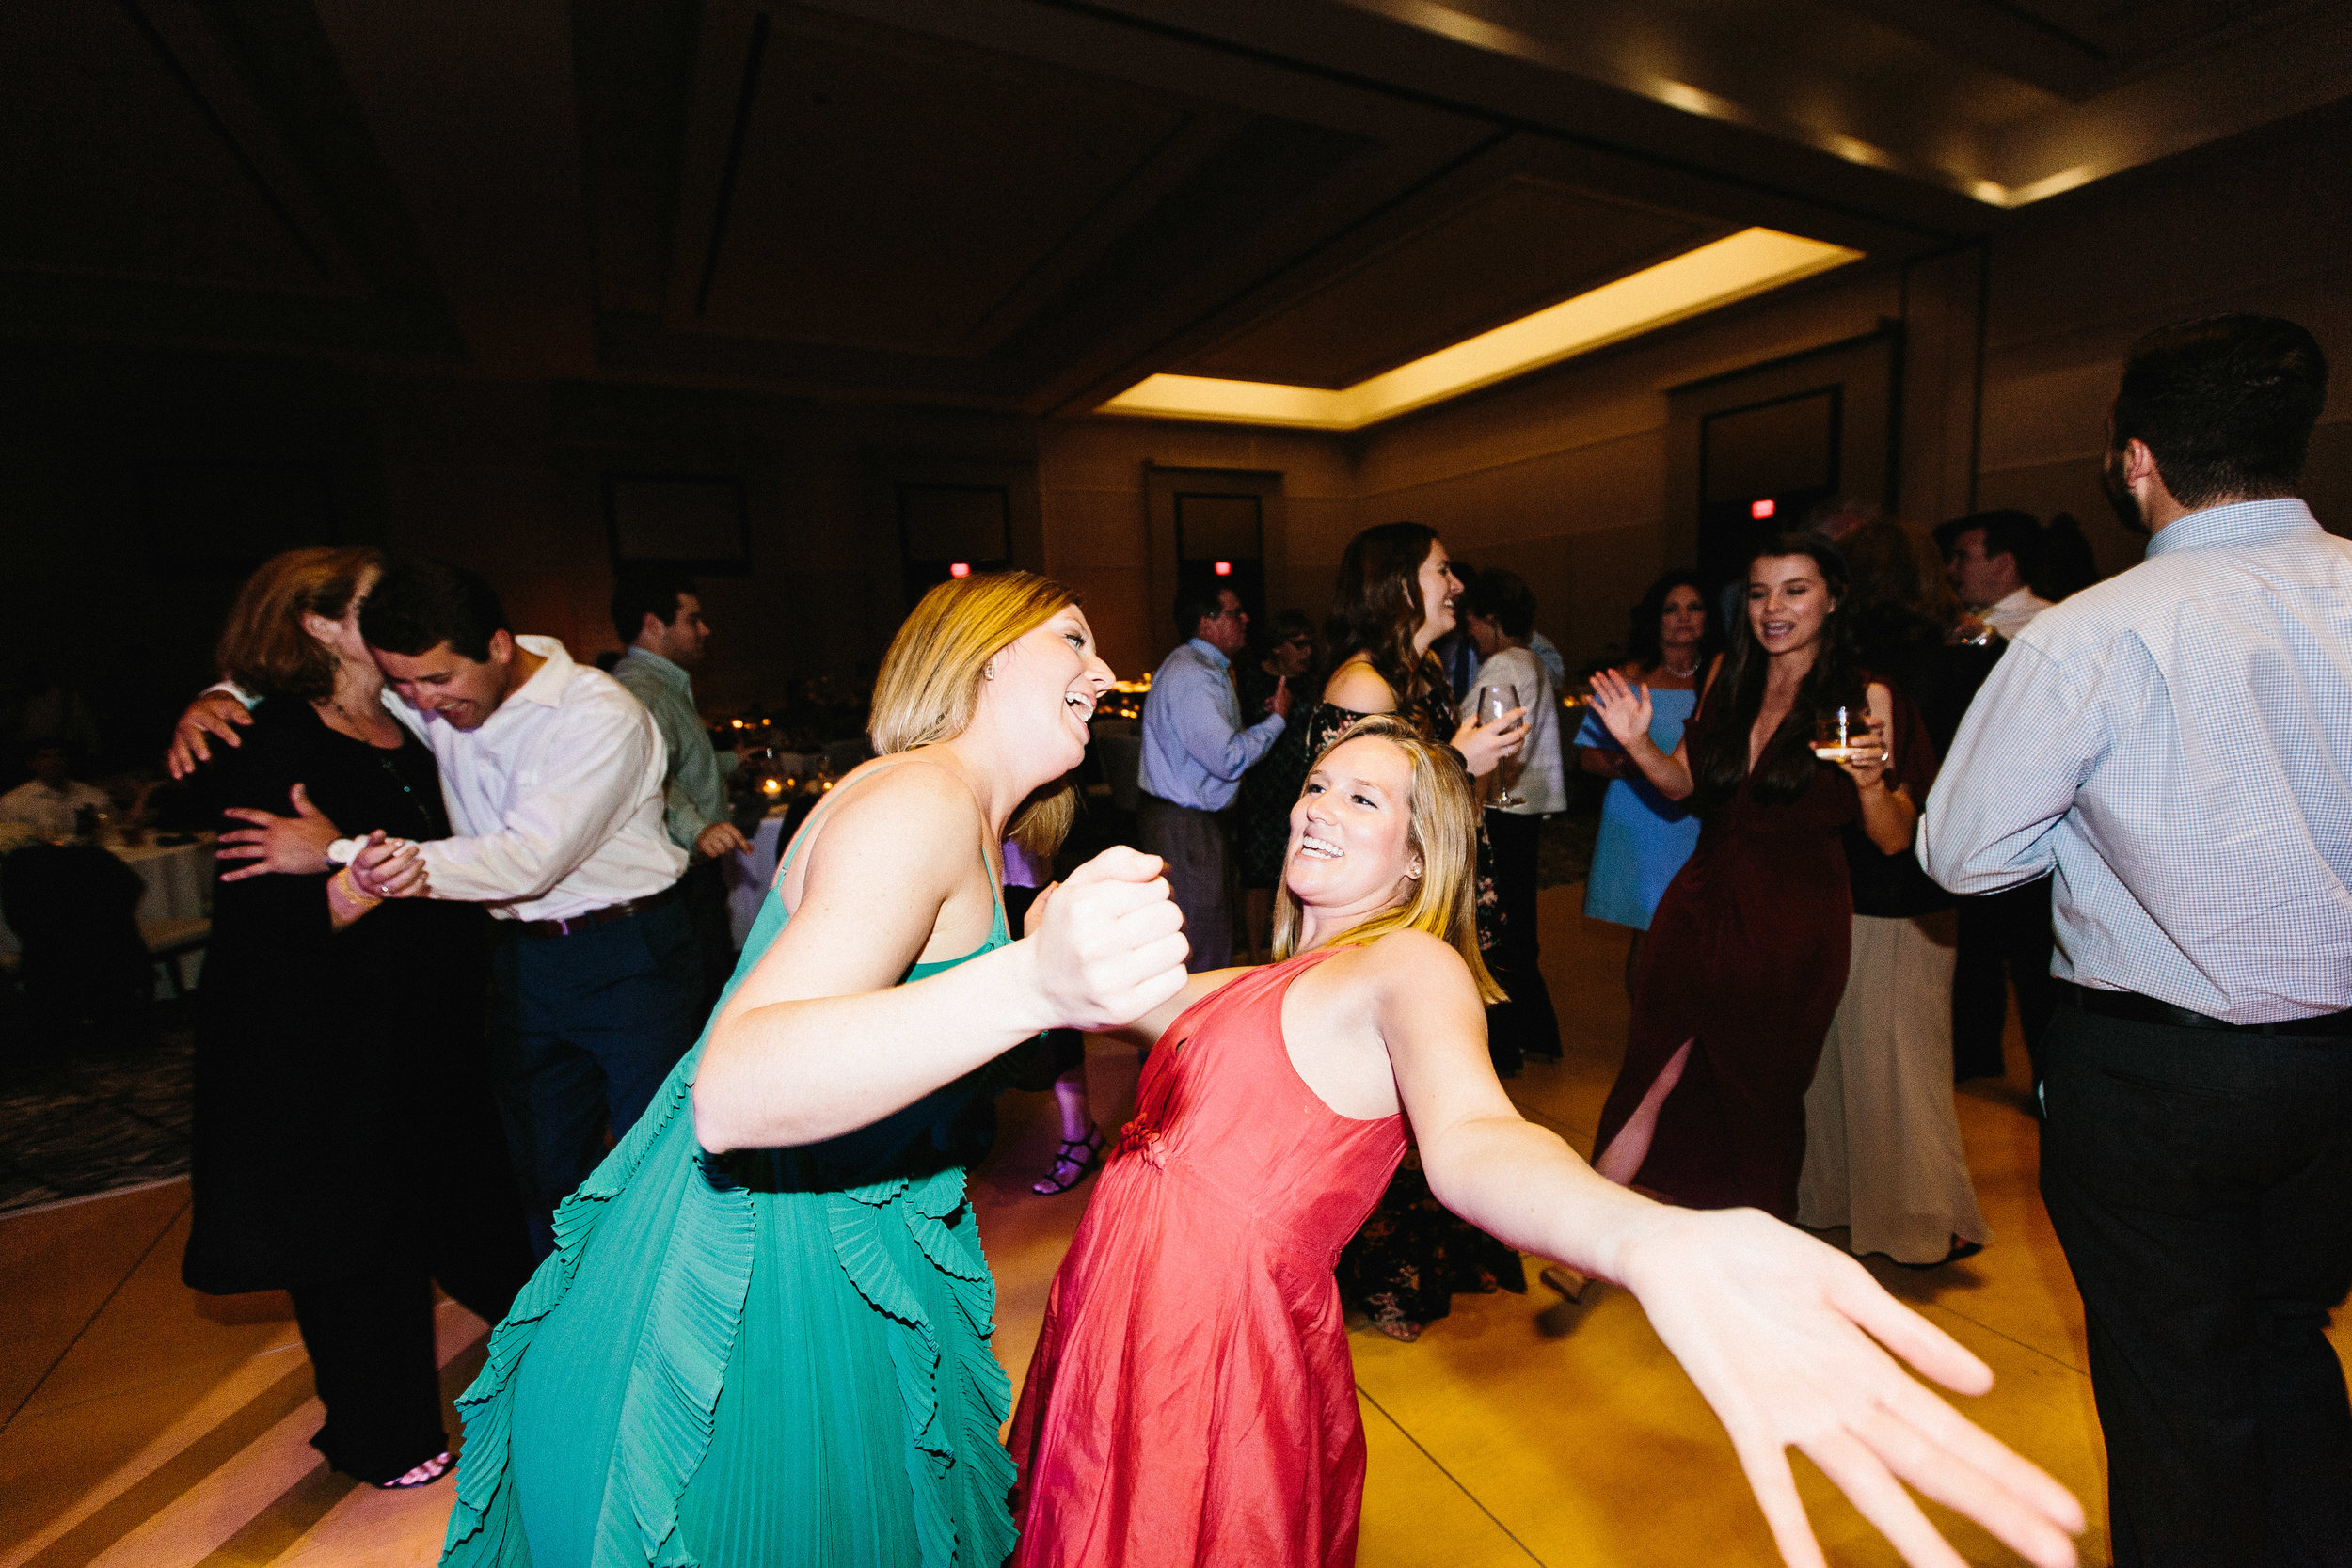 roswell_st_peter_chanel_catholic_avalon_hotel_alpharetta_wedding-2189.jpg